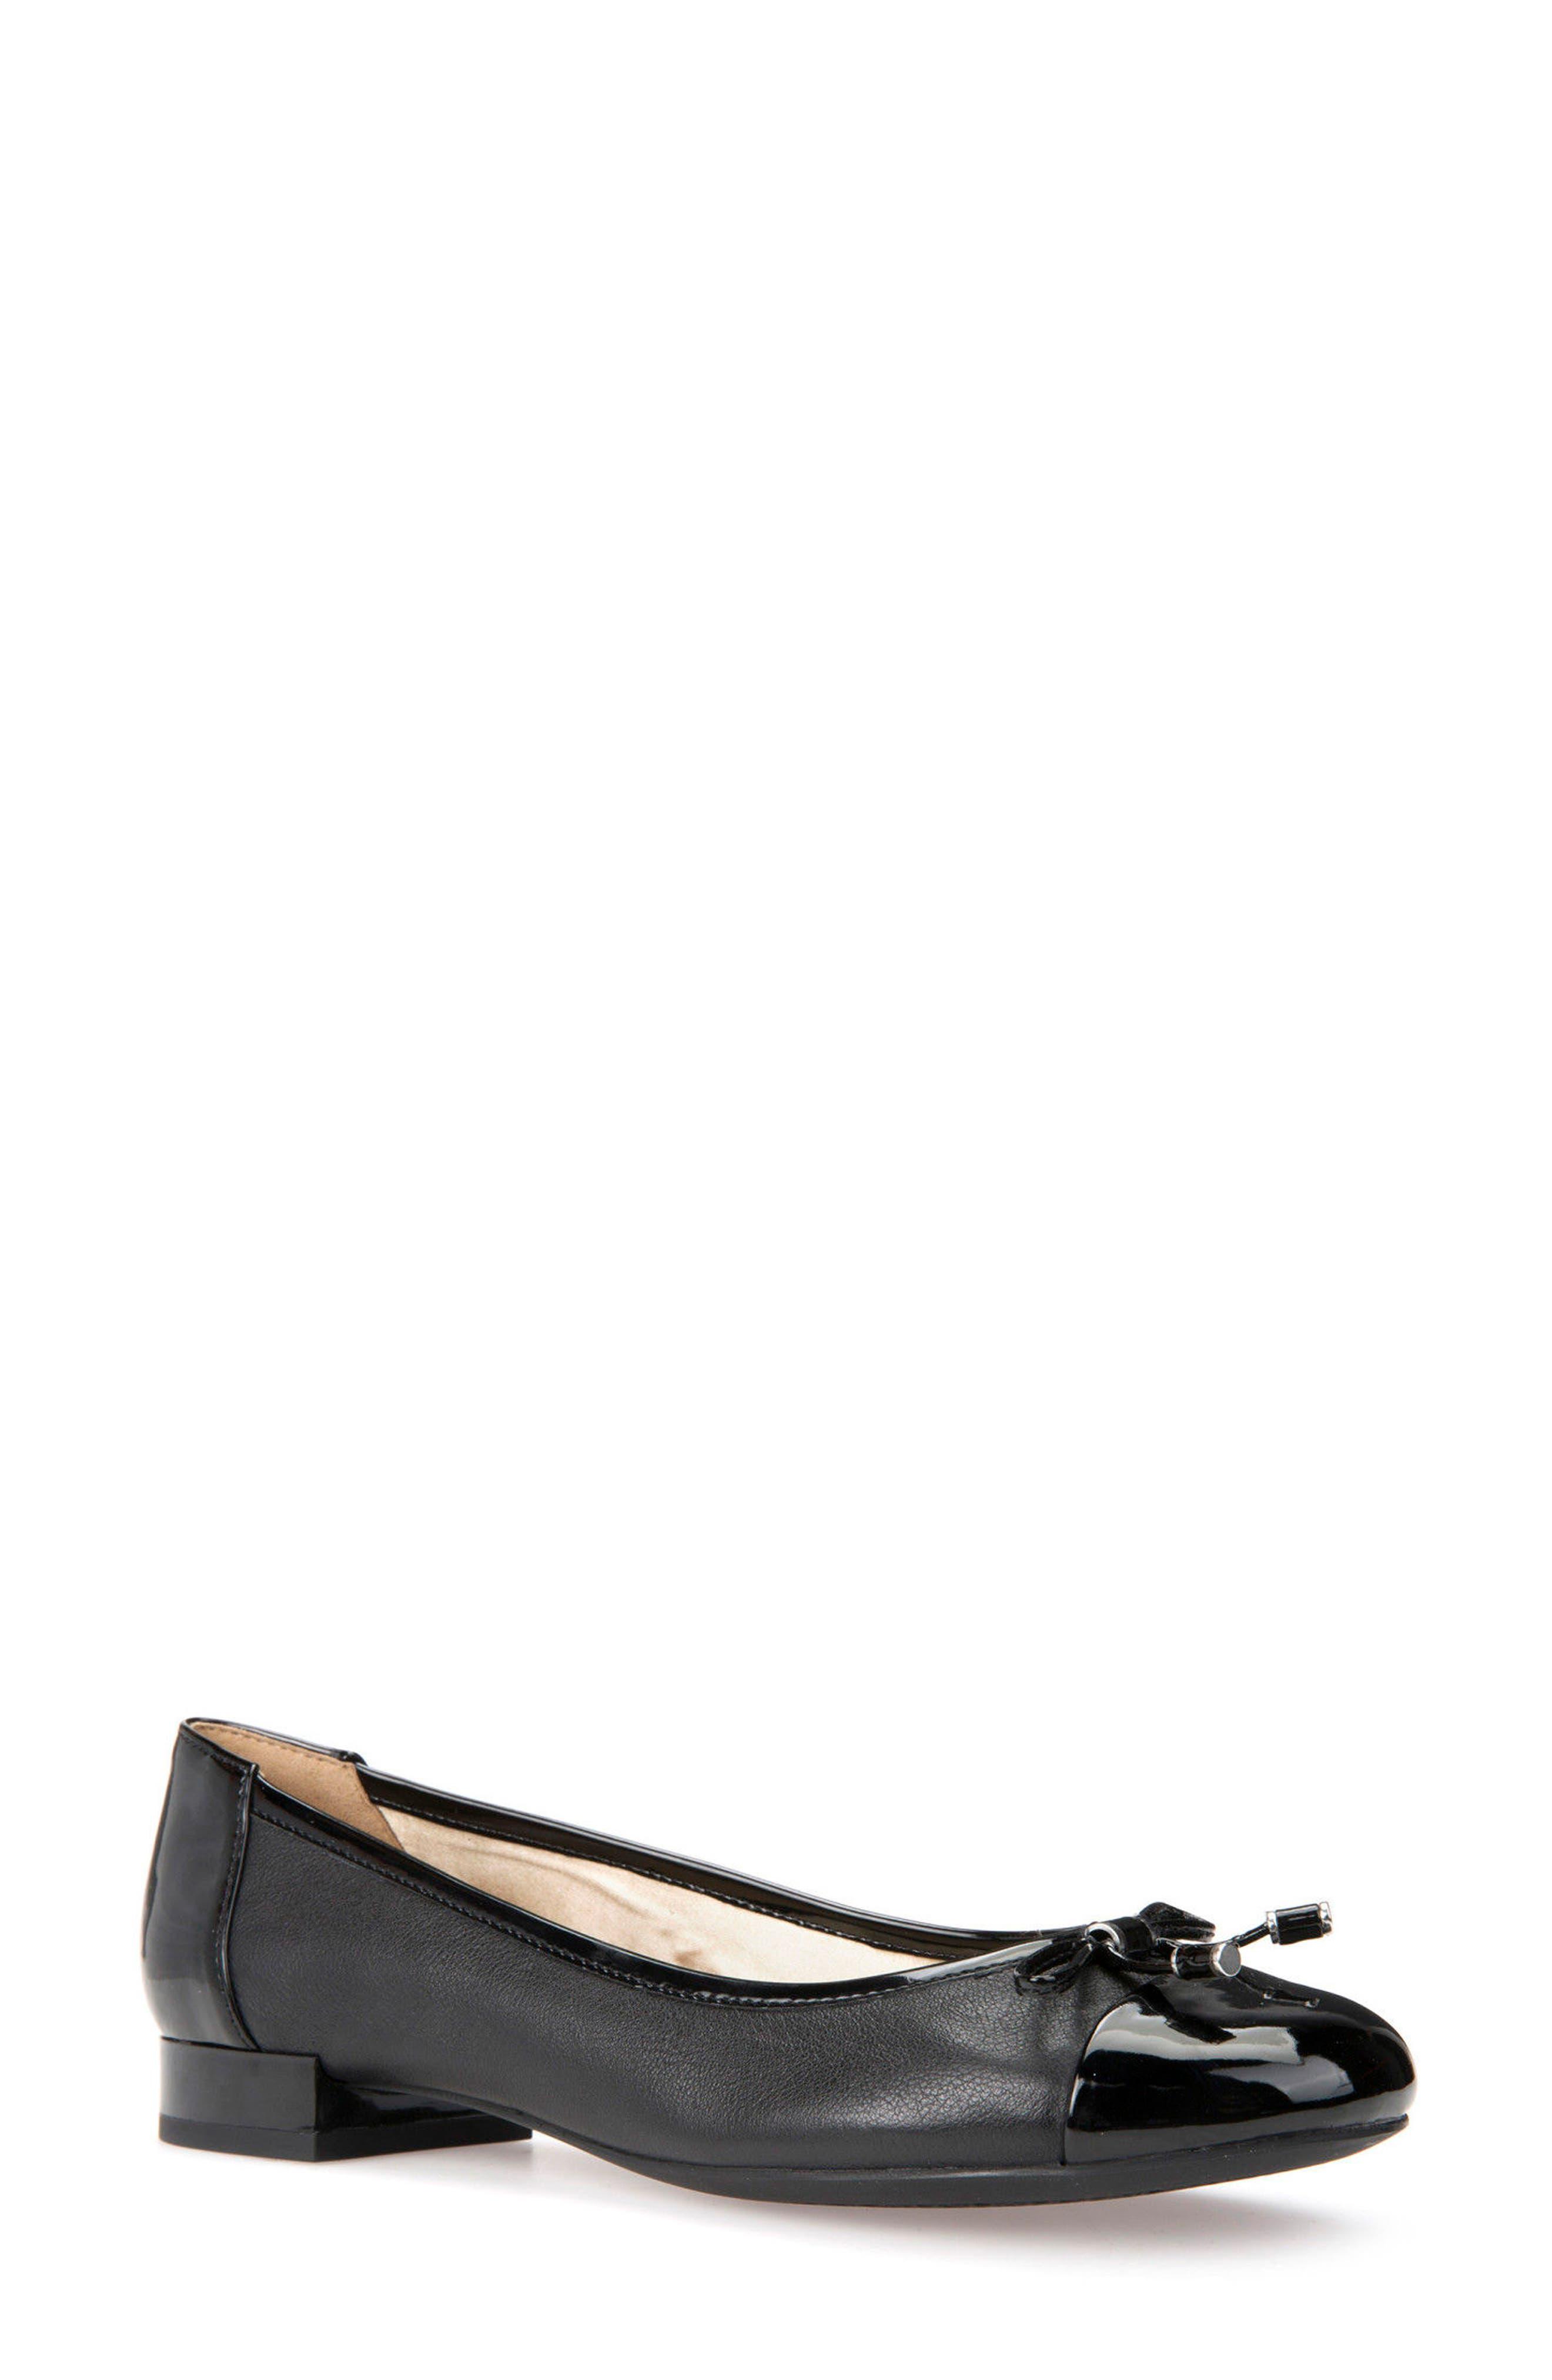 Wistrey Flat,                         Main,                         color, Black Leather